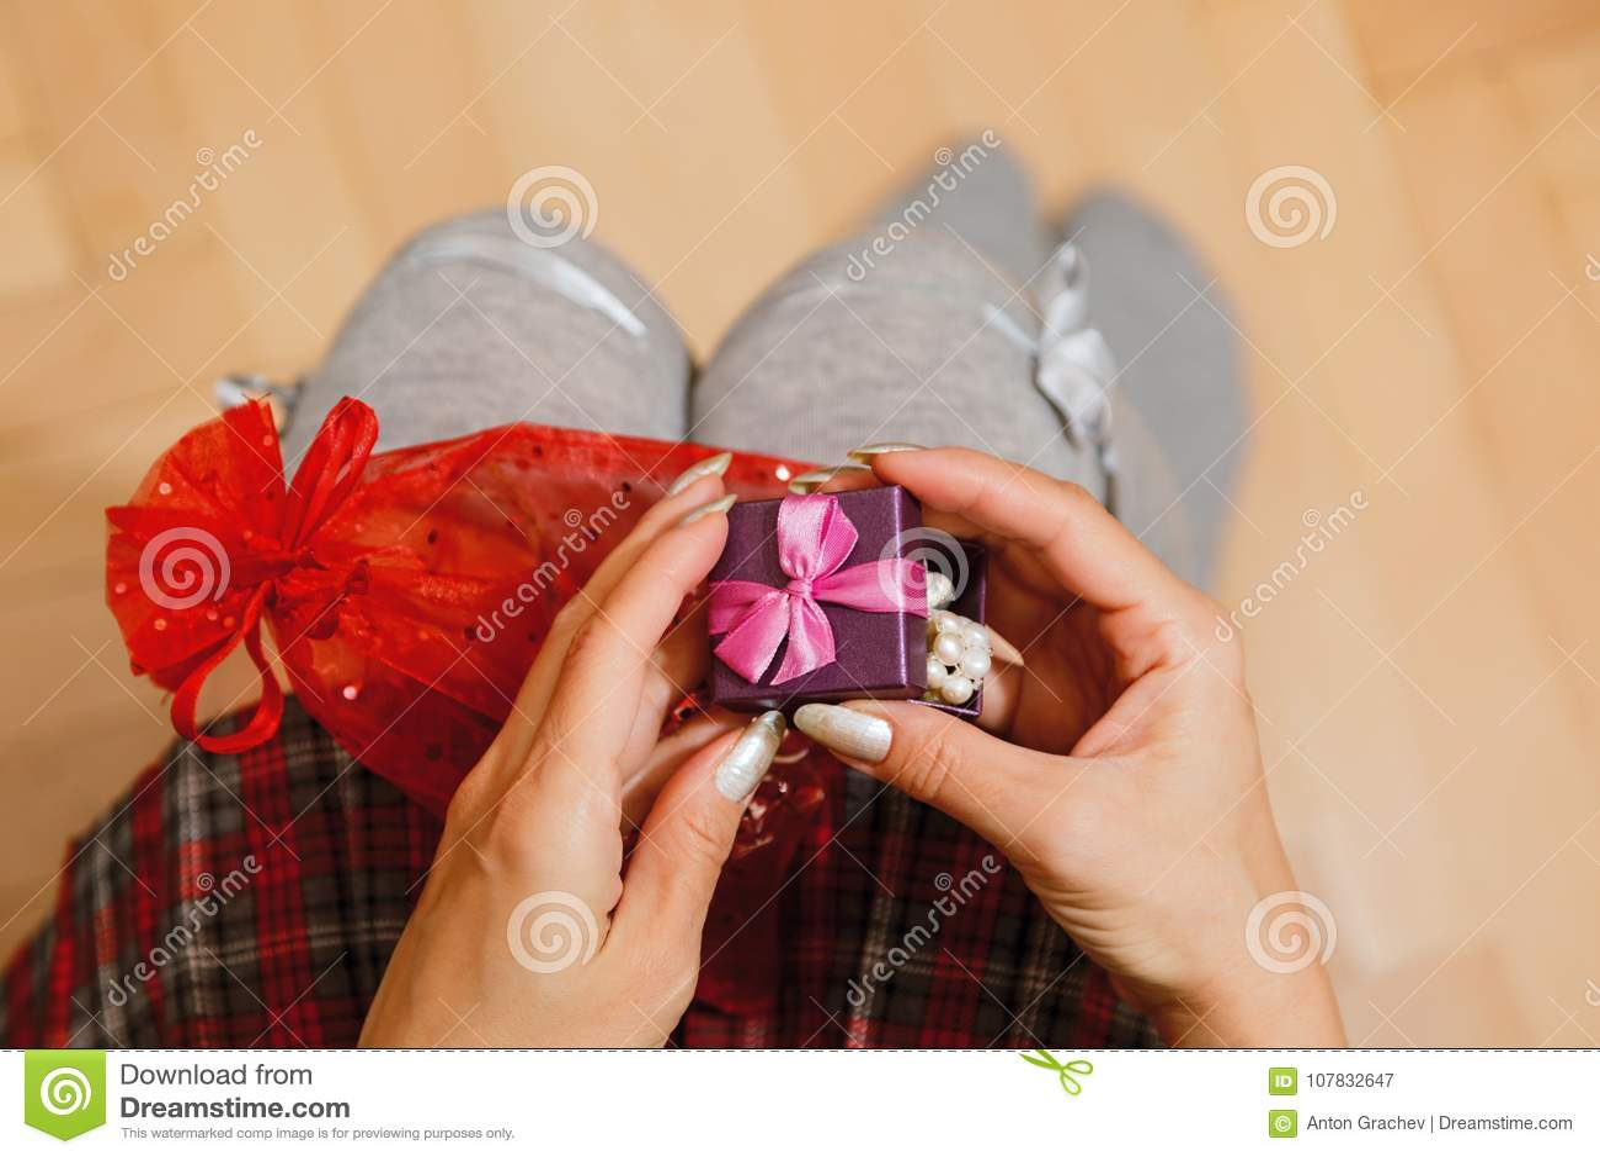 Teenage Female Person In Schoolgirl Skirt Unpacking Gift